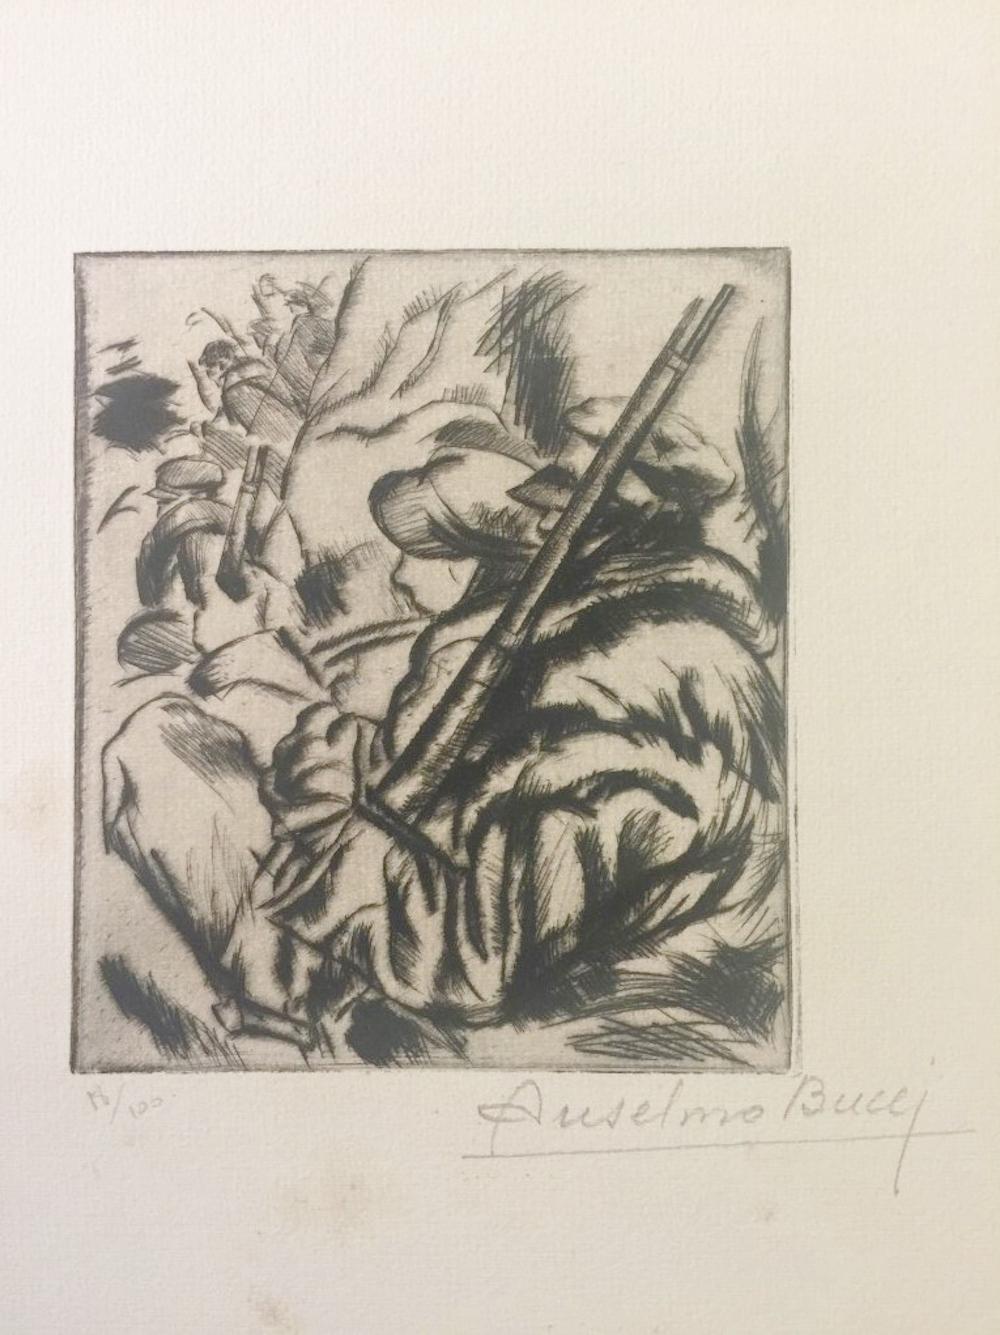 Avant l'Attaque - Original Etching by Anselmo Bucci - 1917